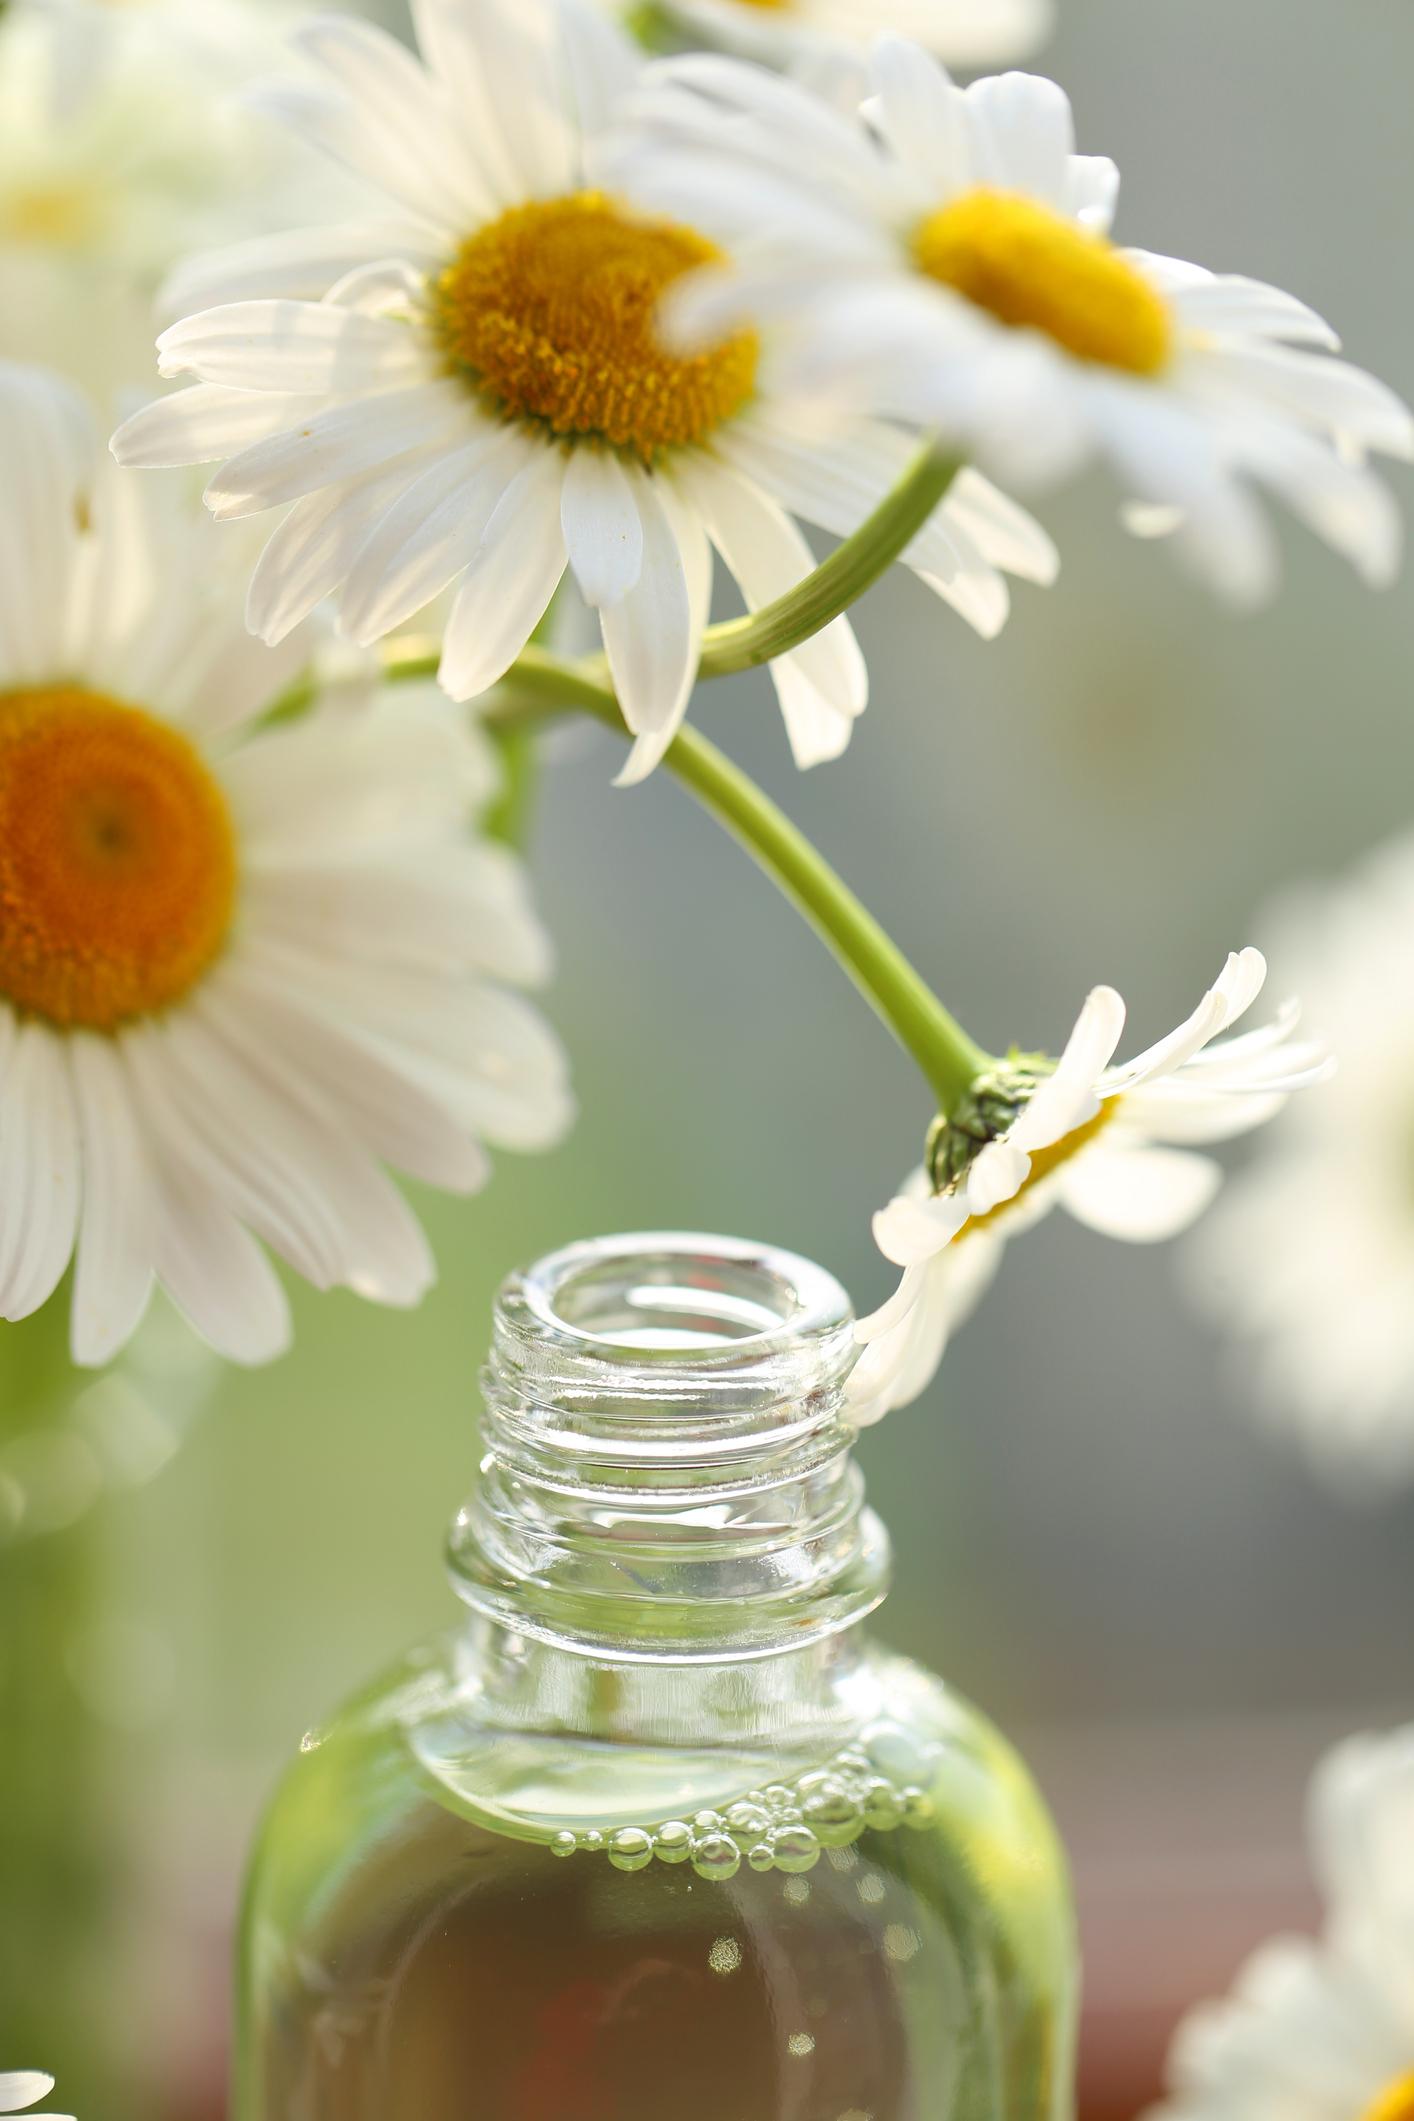 6 Wirksame Hausmittel Gegen Juckende Kopfhaut Desiredde